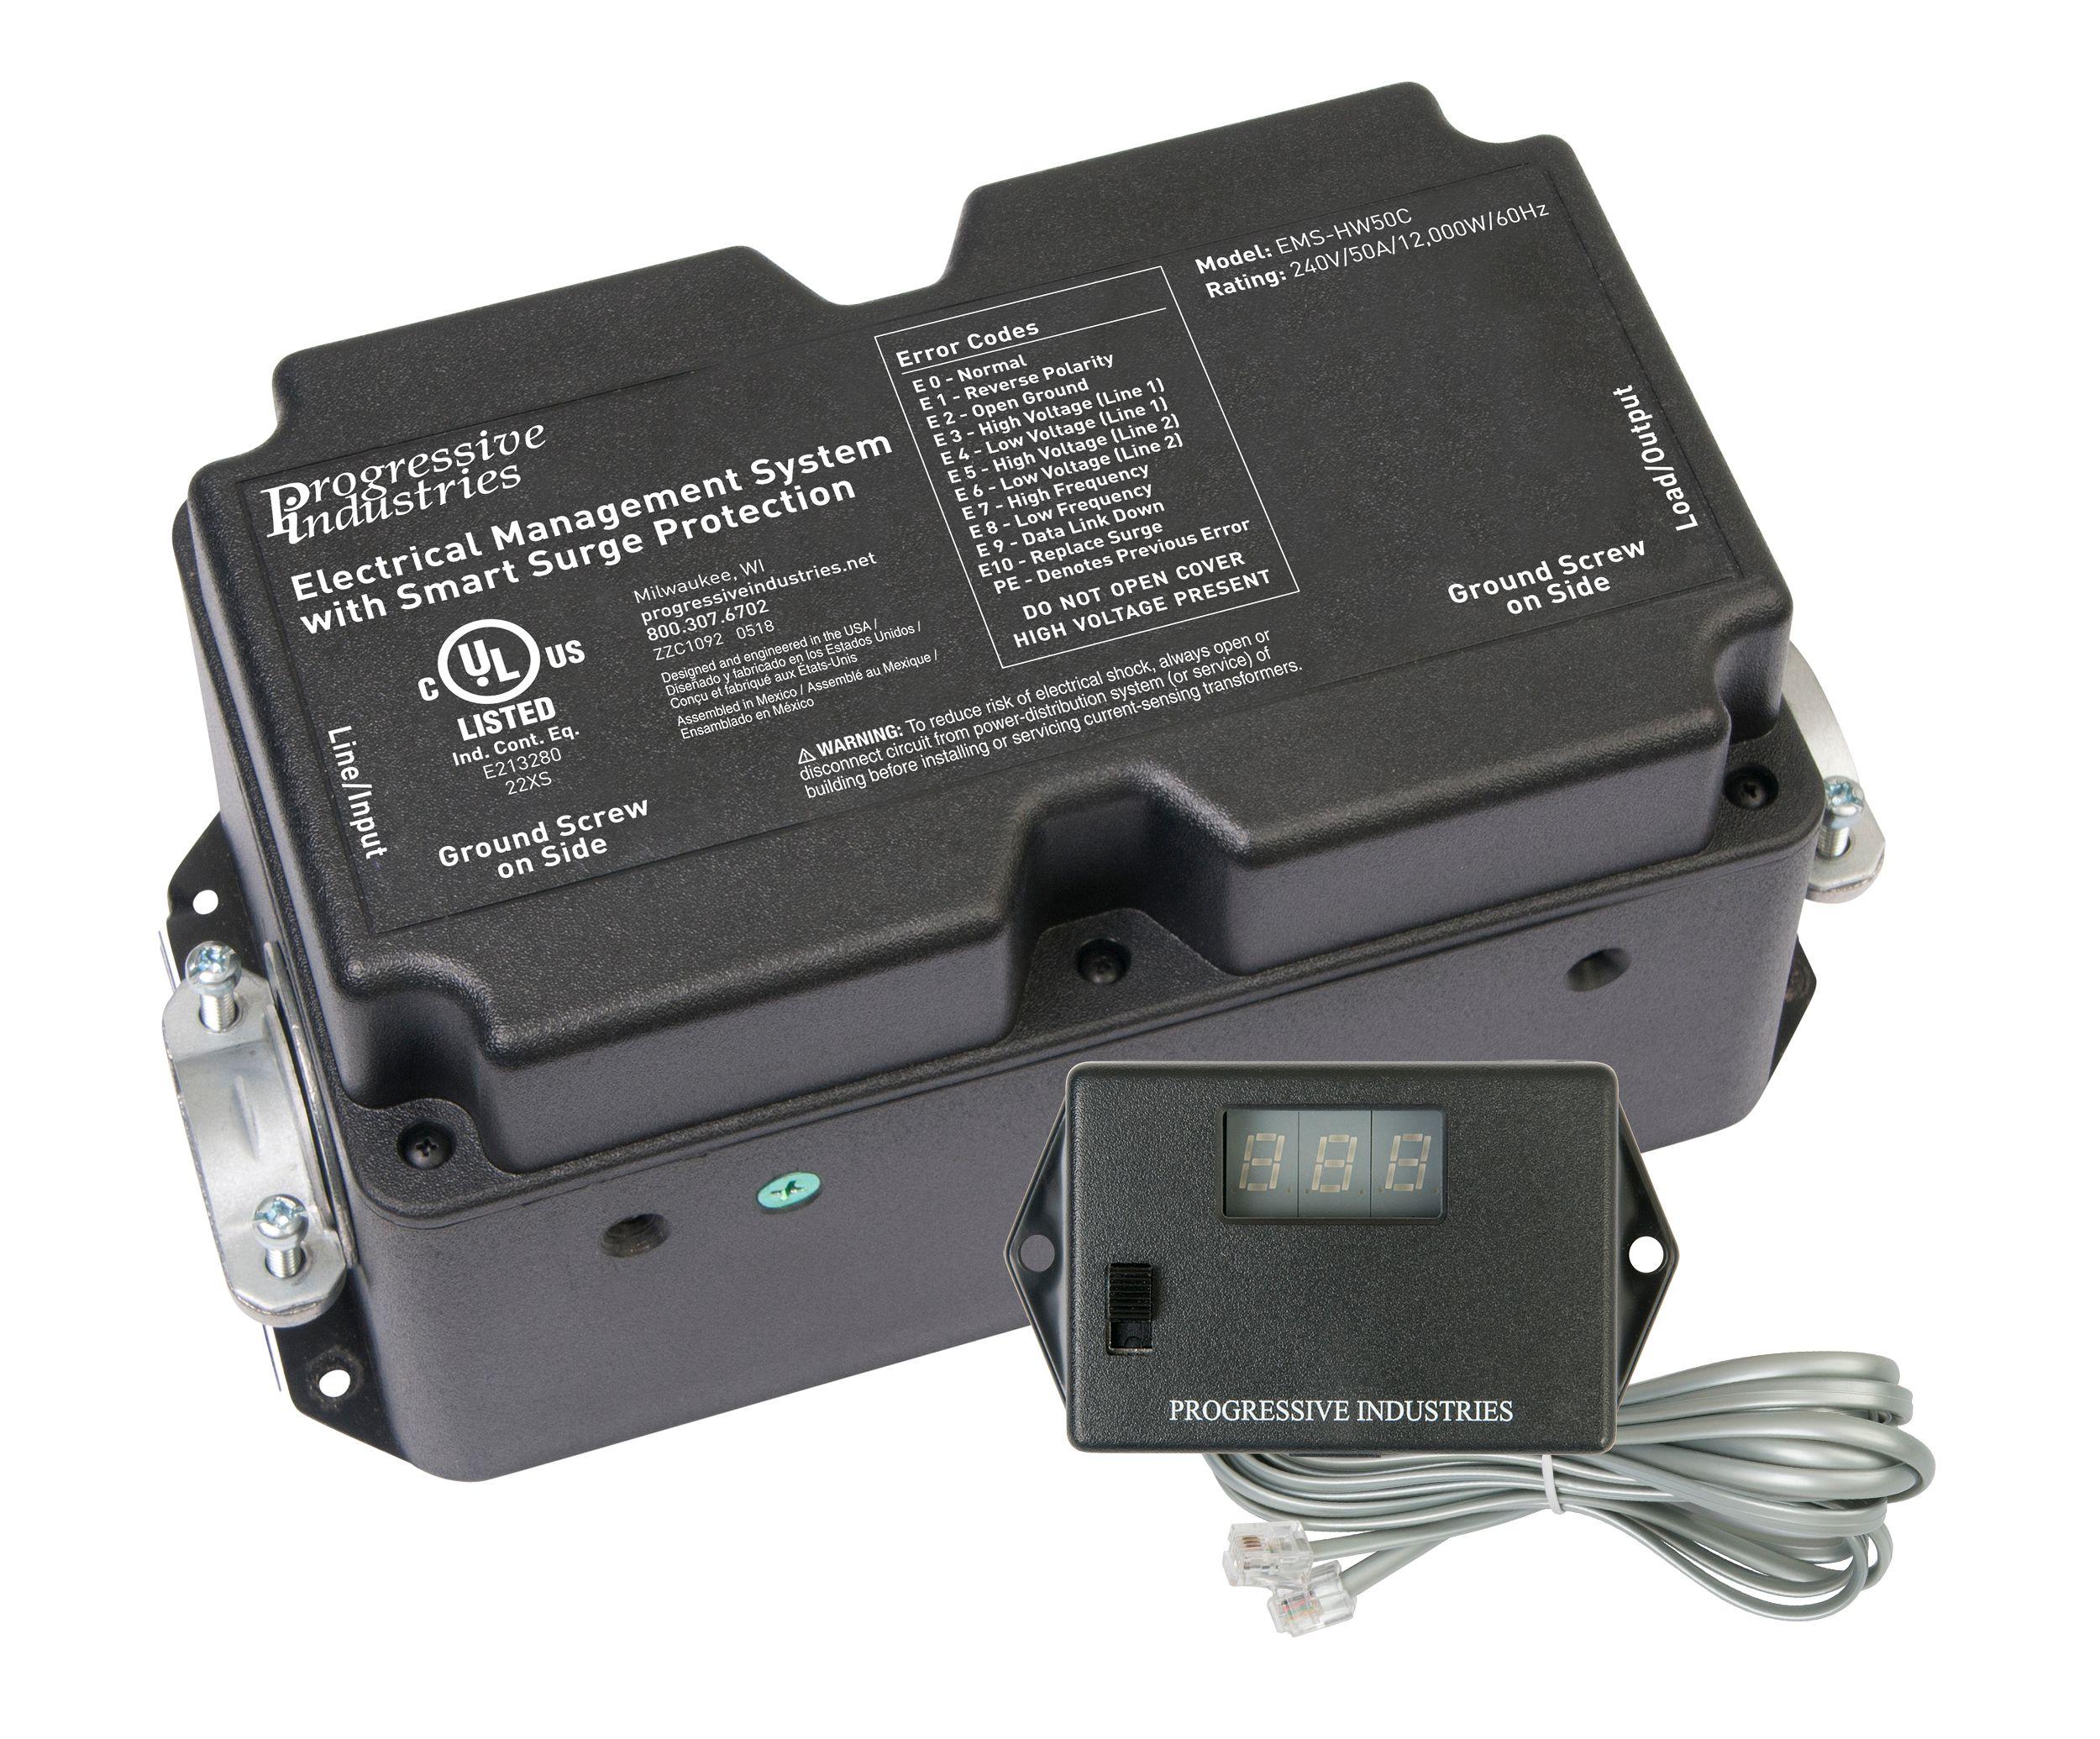 Progressive Industries EMS-HW50C